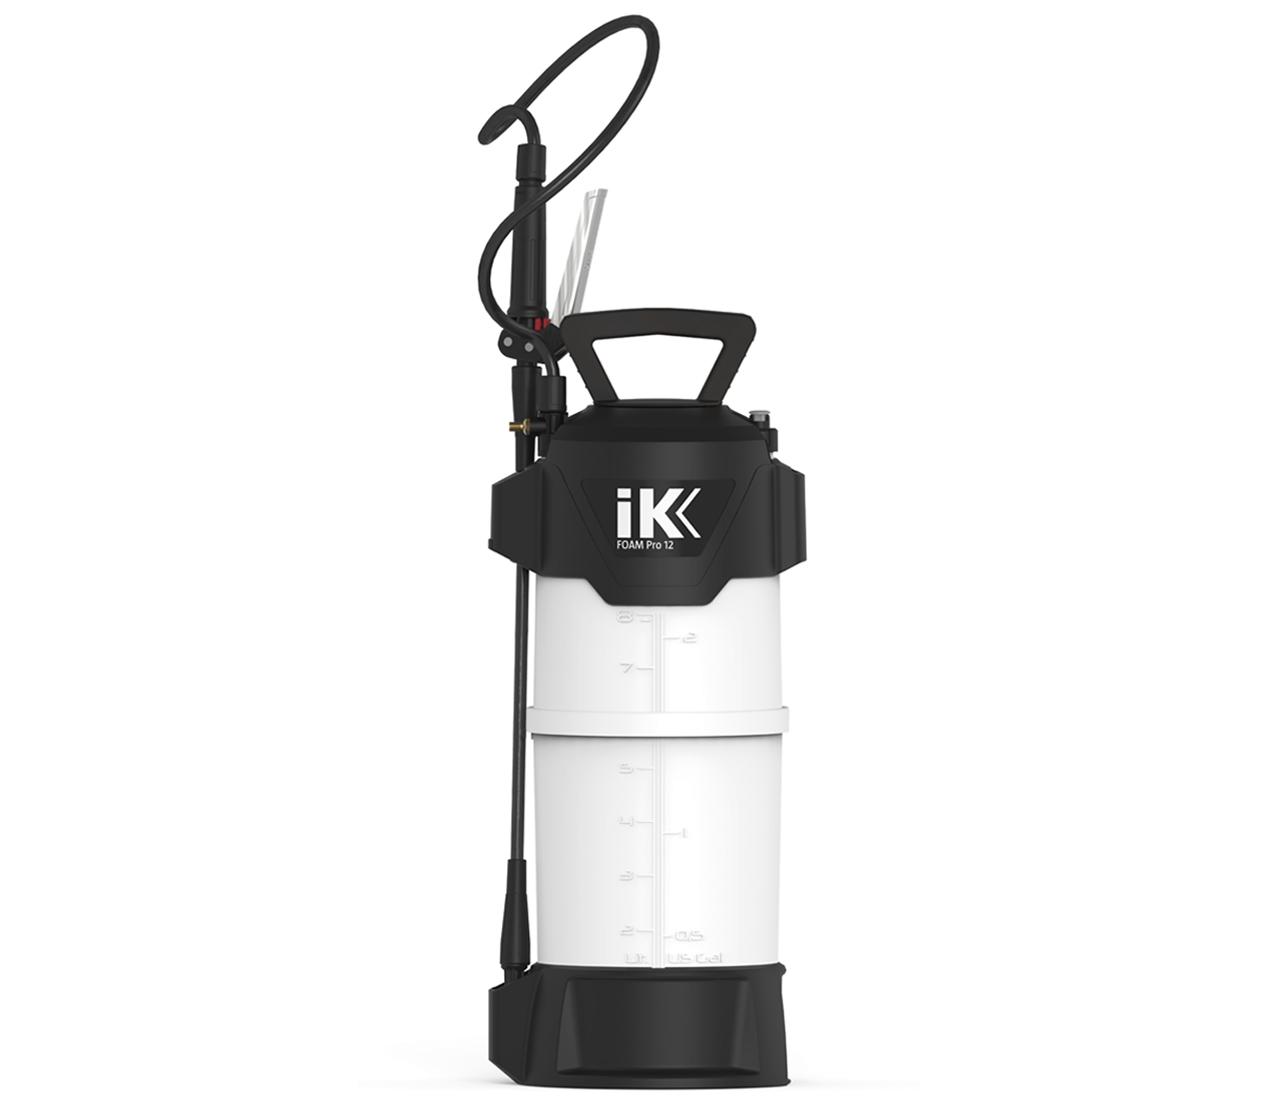 Pulverizador Profissional Manual Ik Foam Pro 12